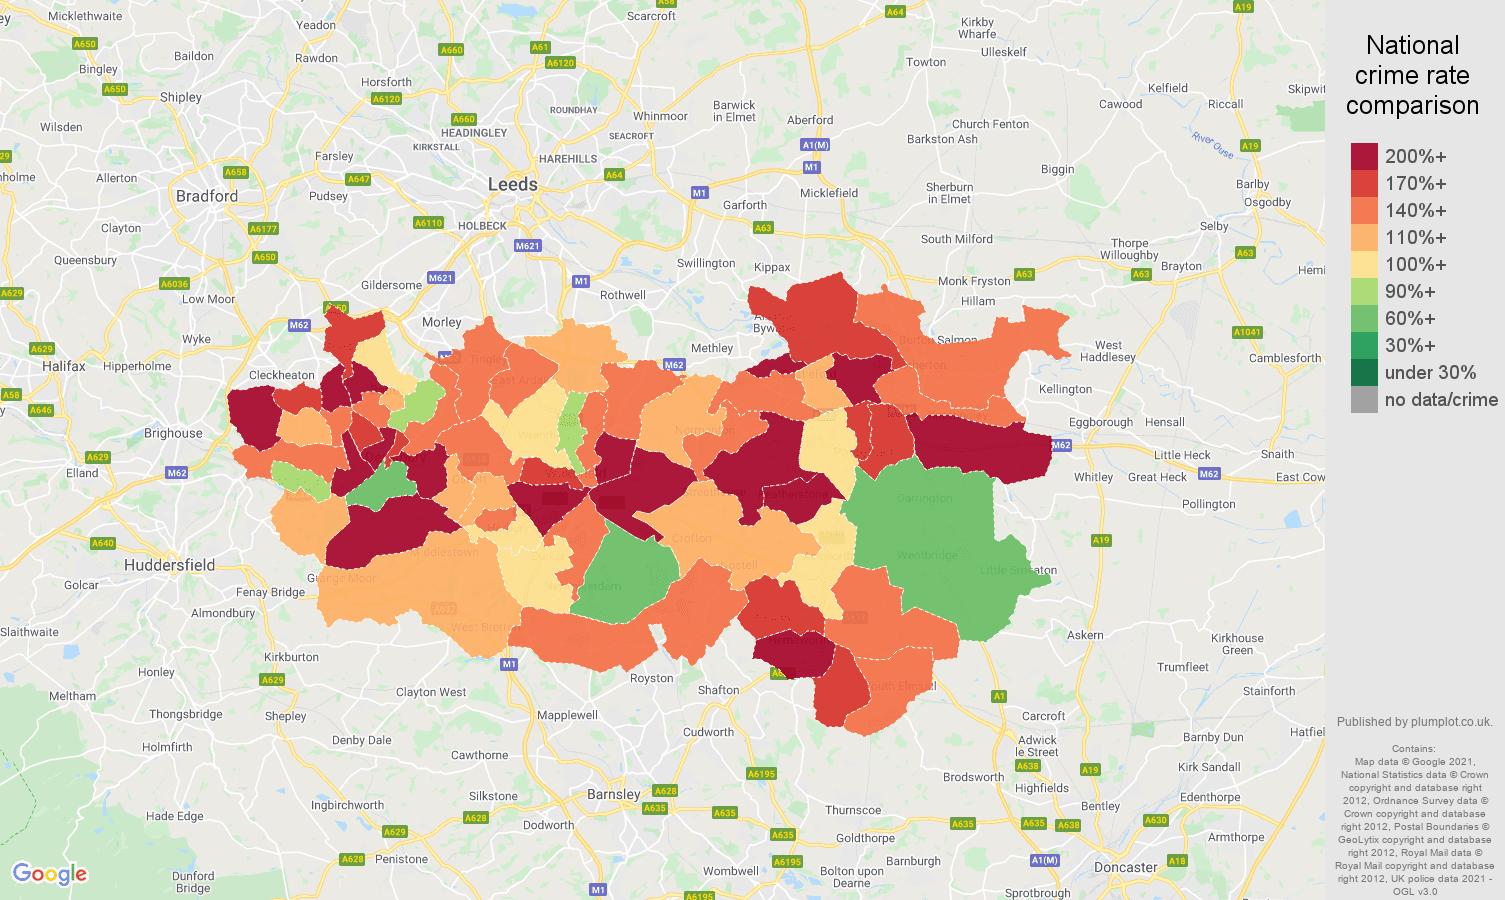 Wakefield violent crime rate comparison map